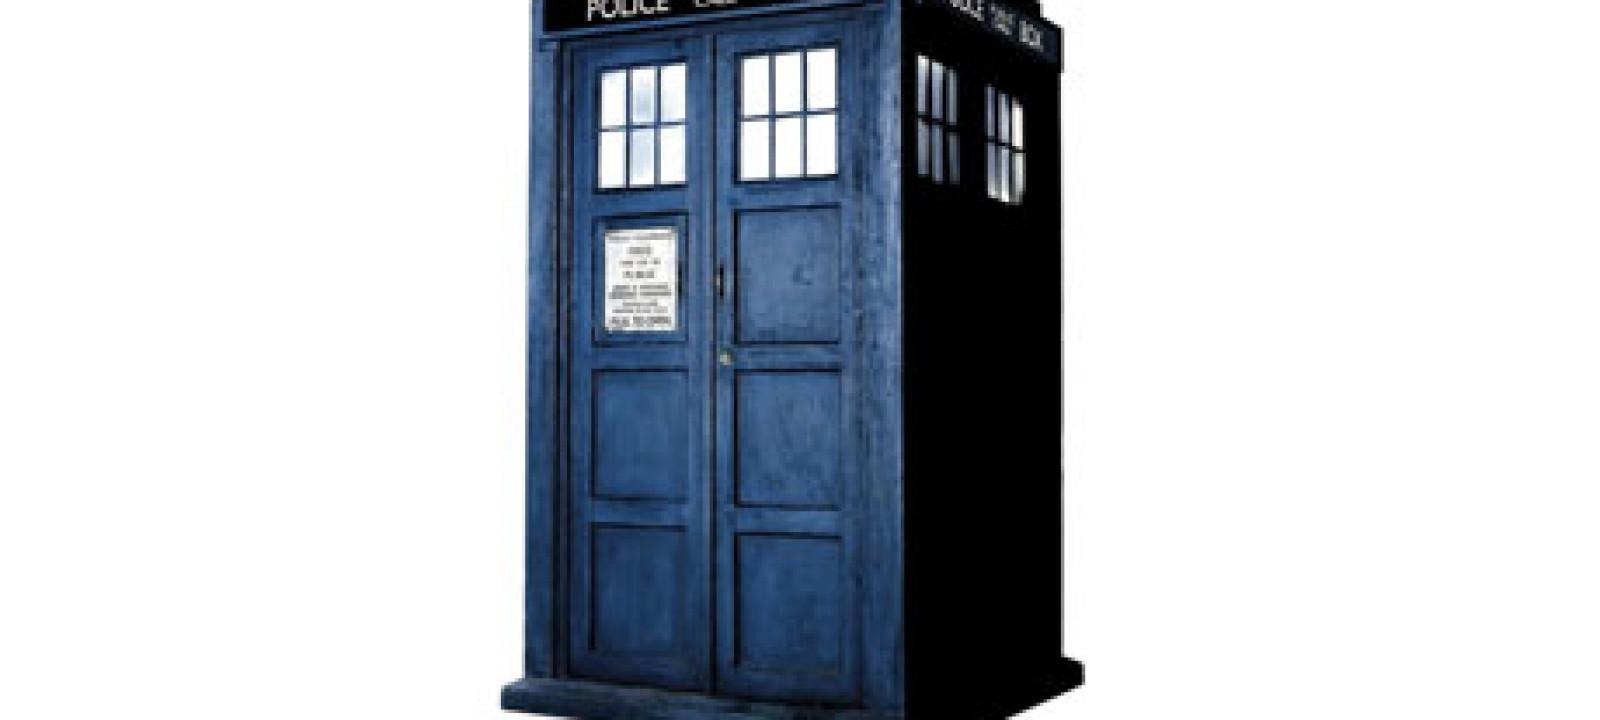 Welcome to the TARDIS